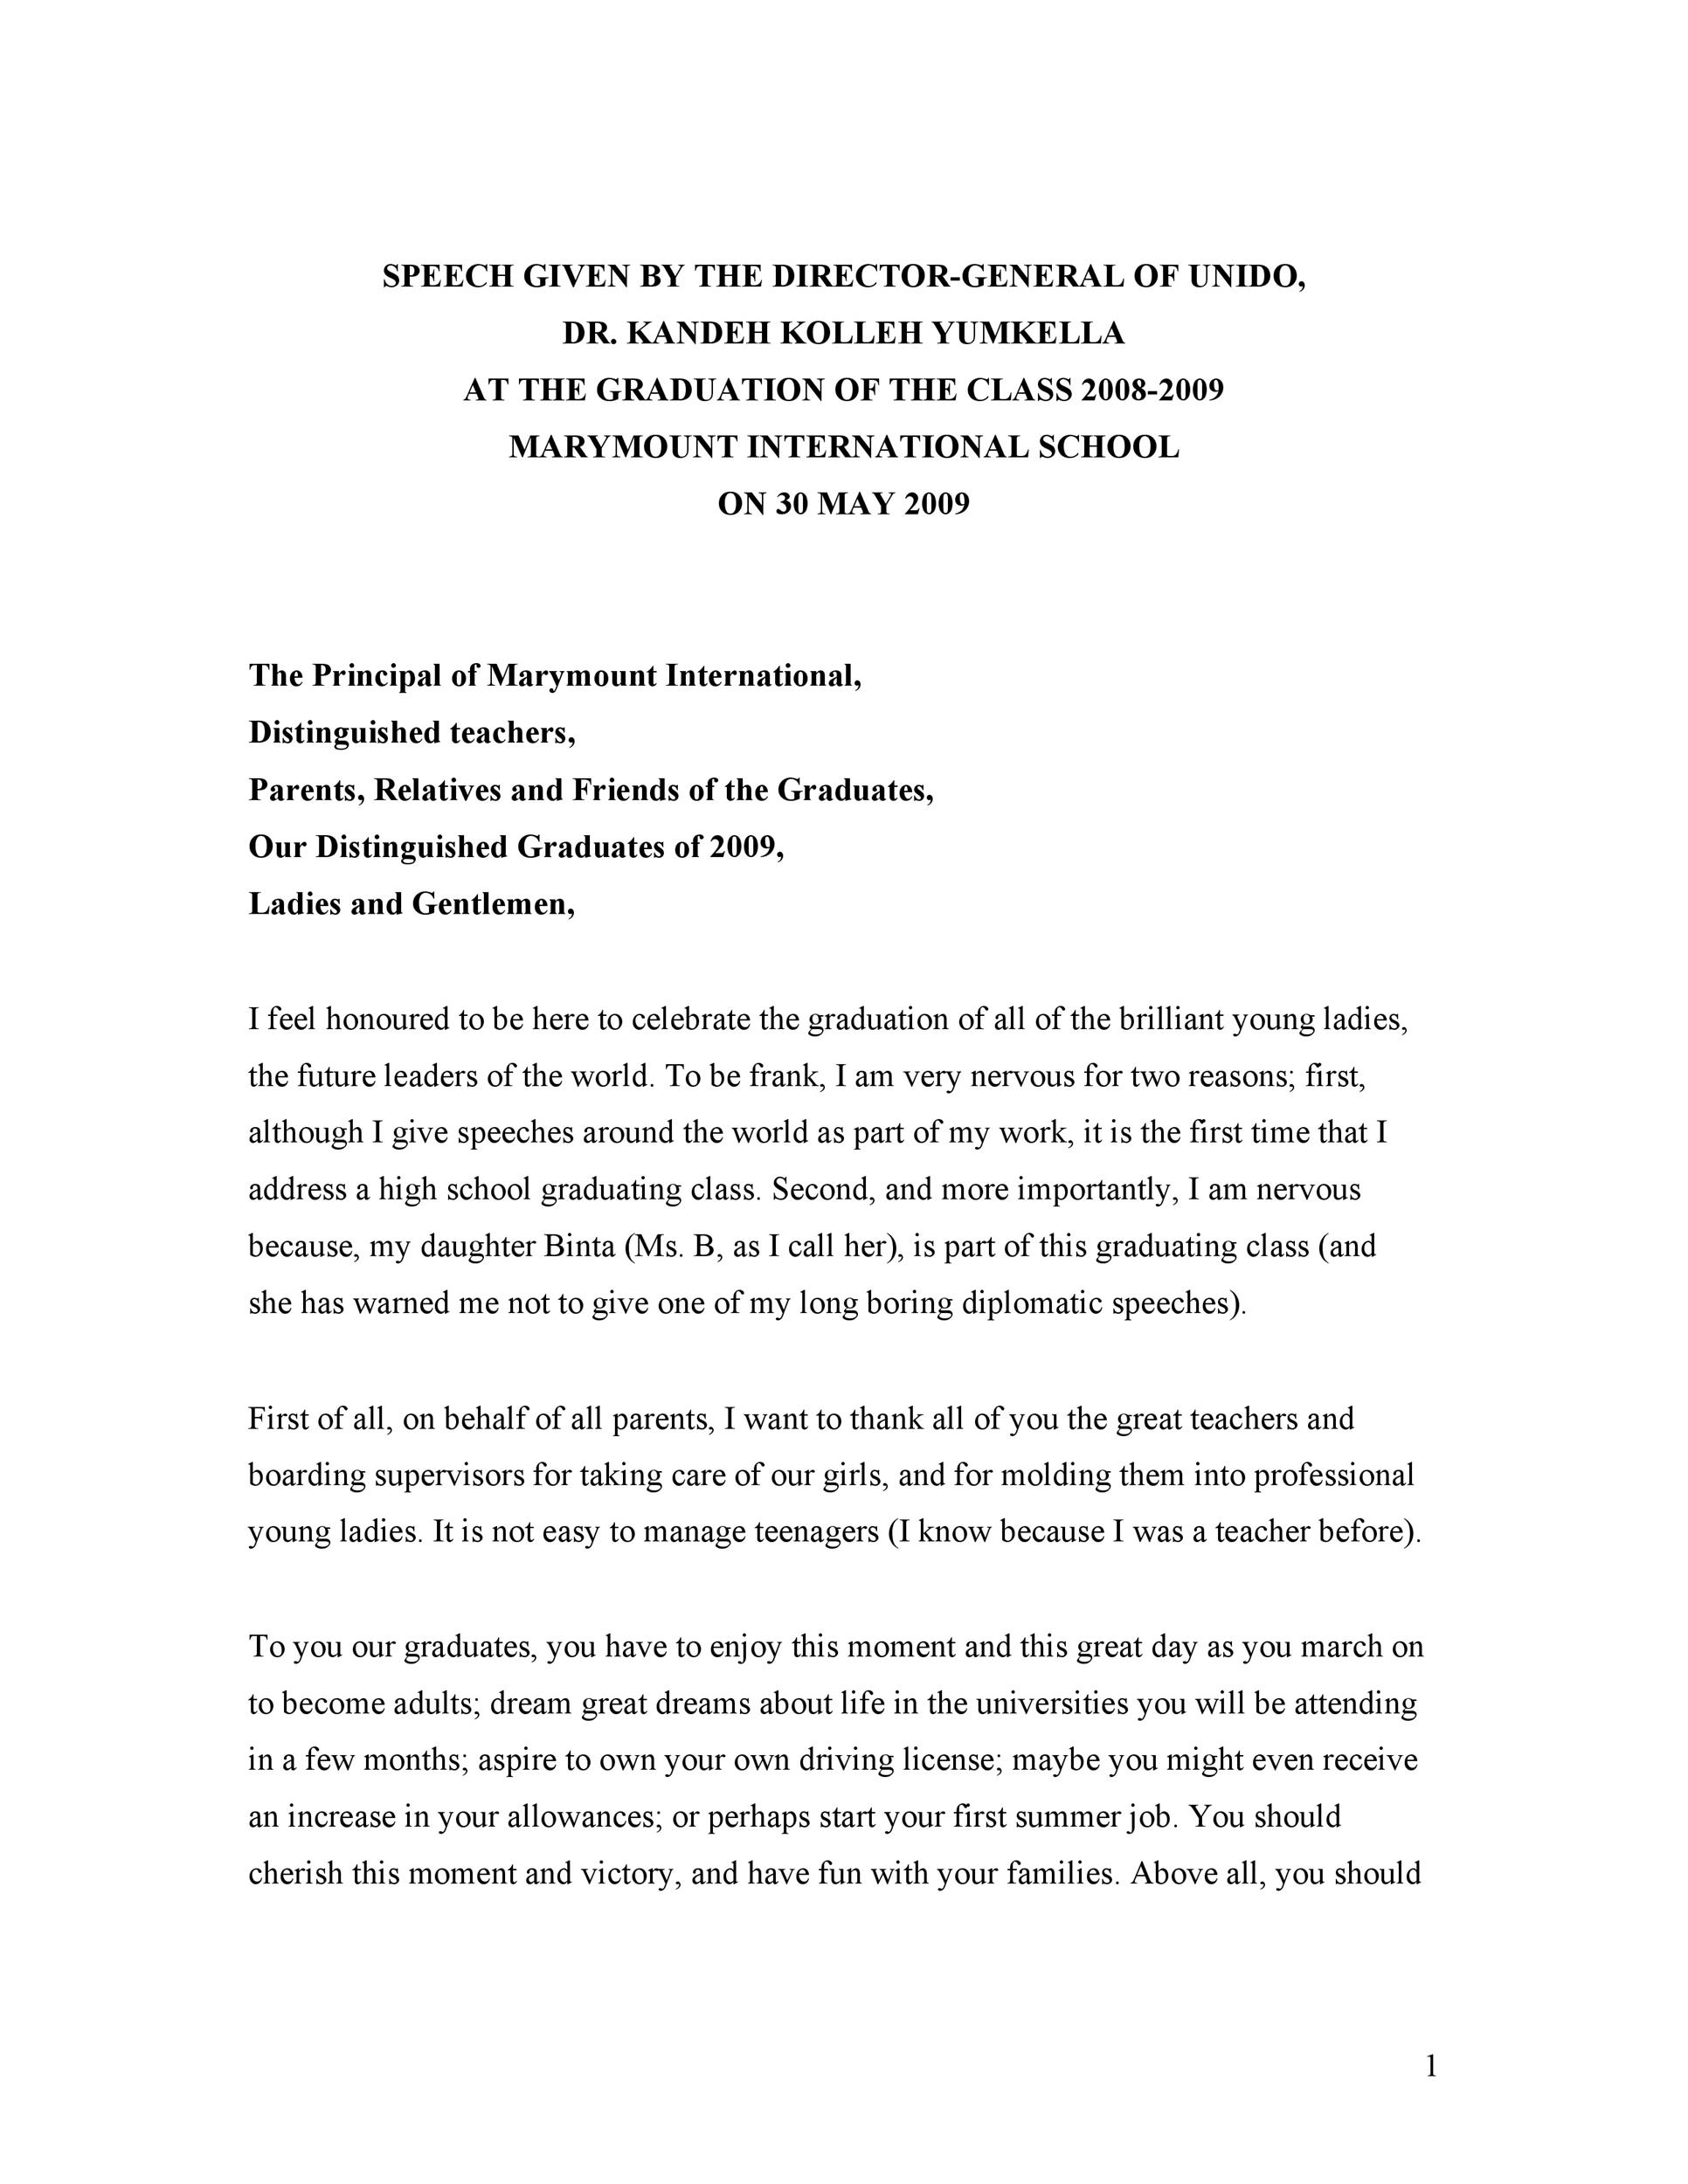 Free graduation speech example 17